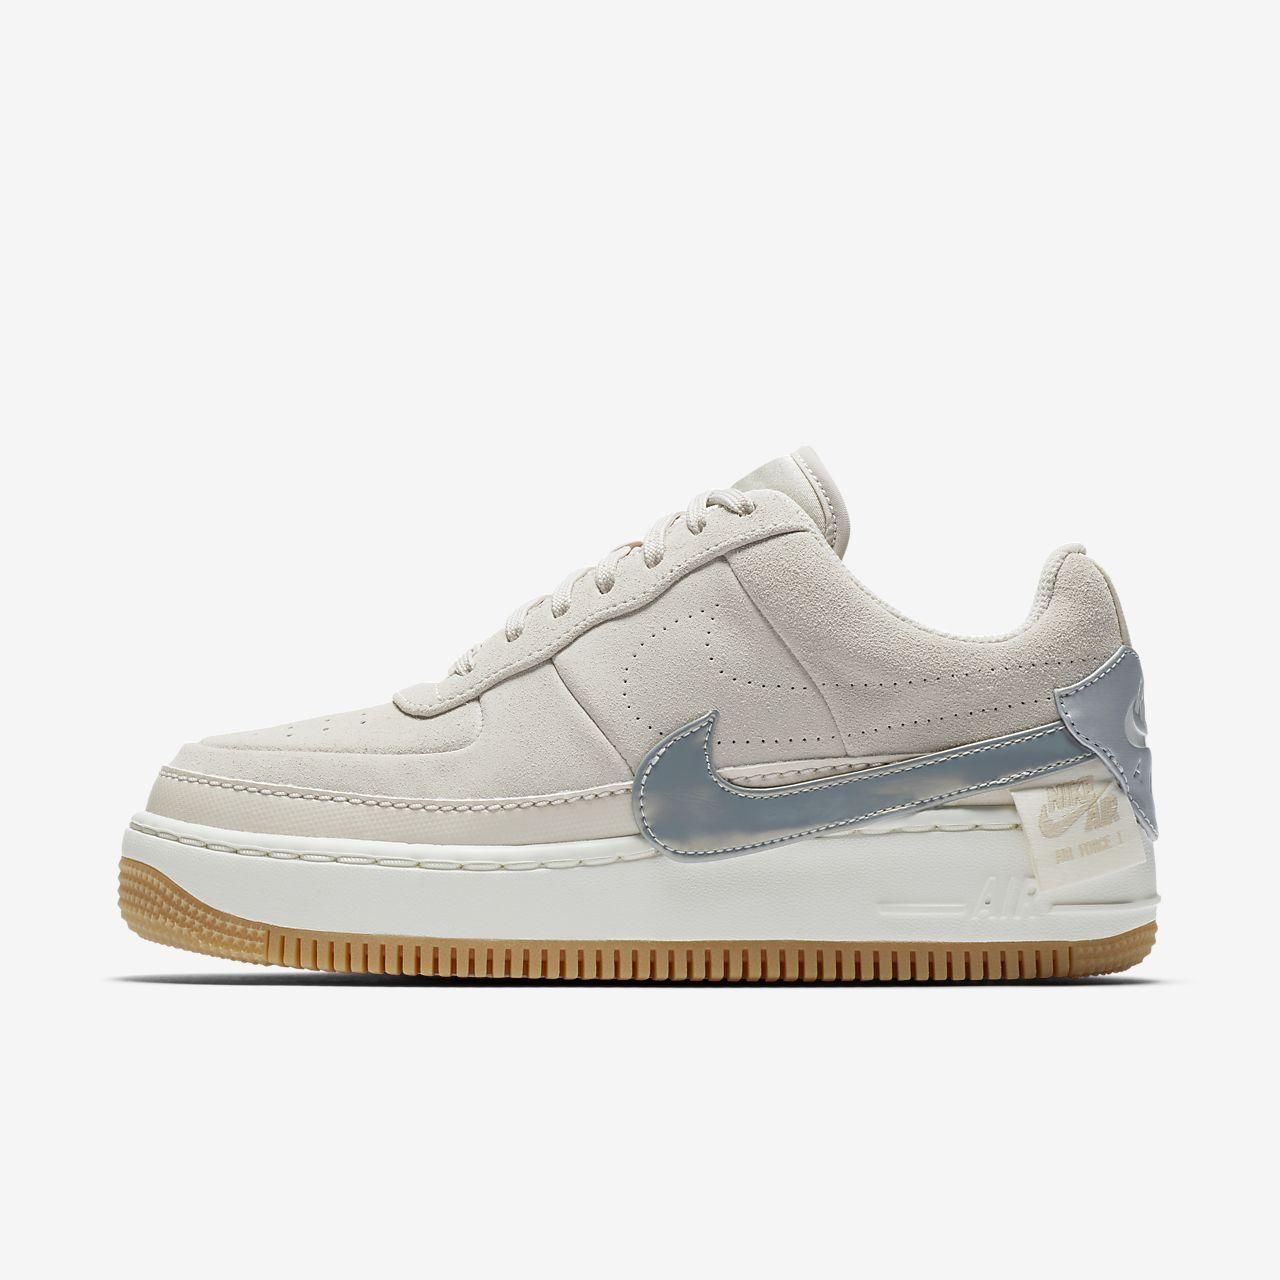 Nike Air Force 1 Jester Suede Metallic Women's Shoe